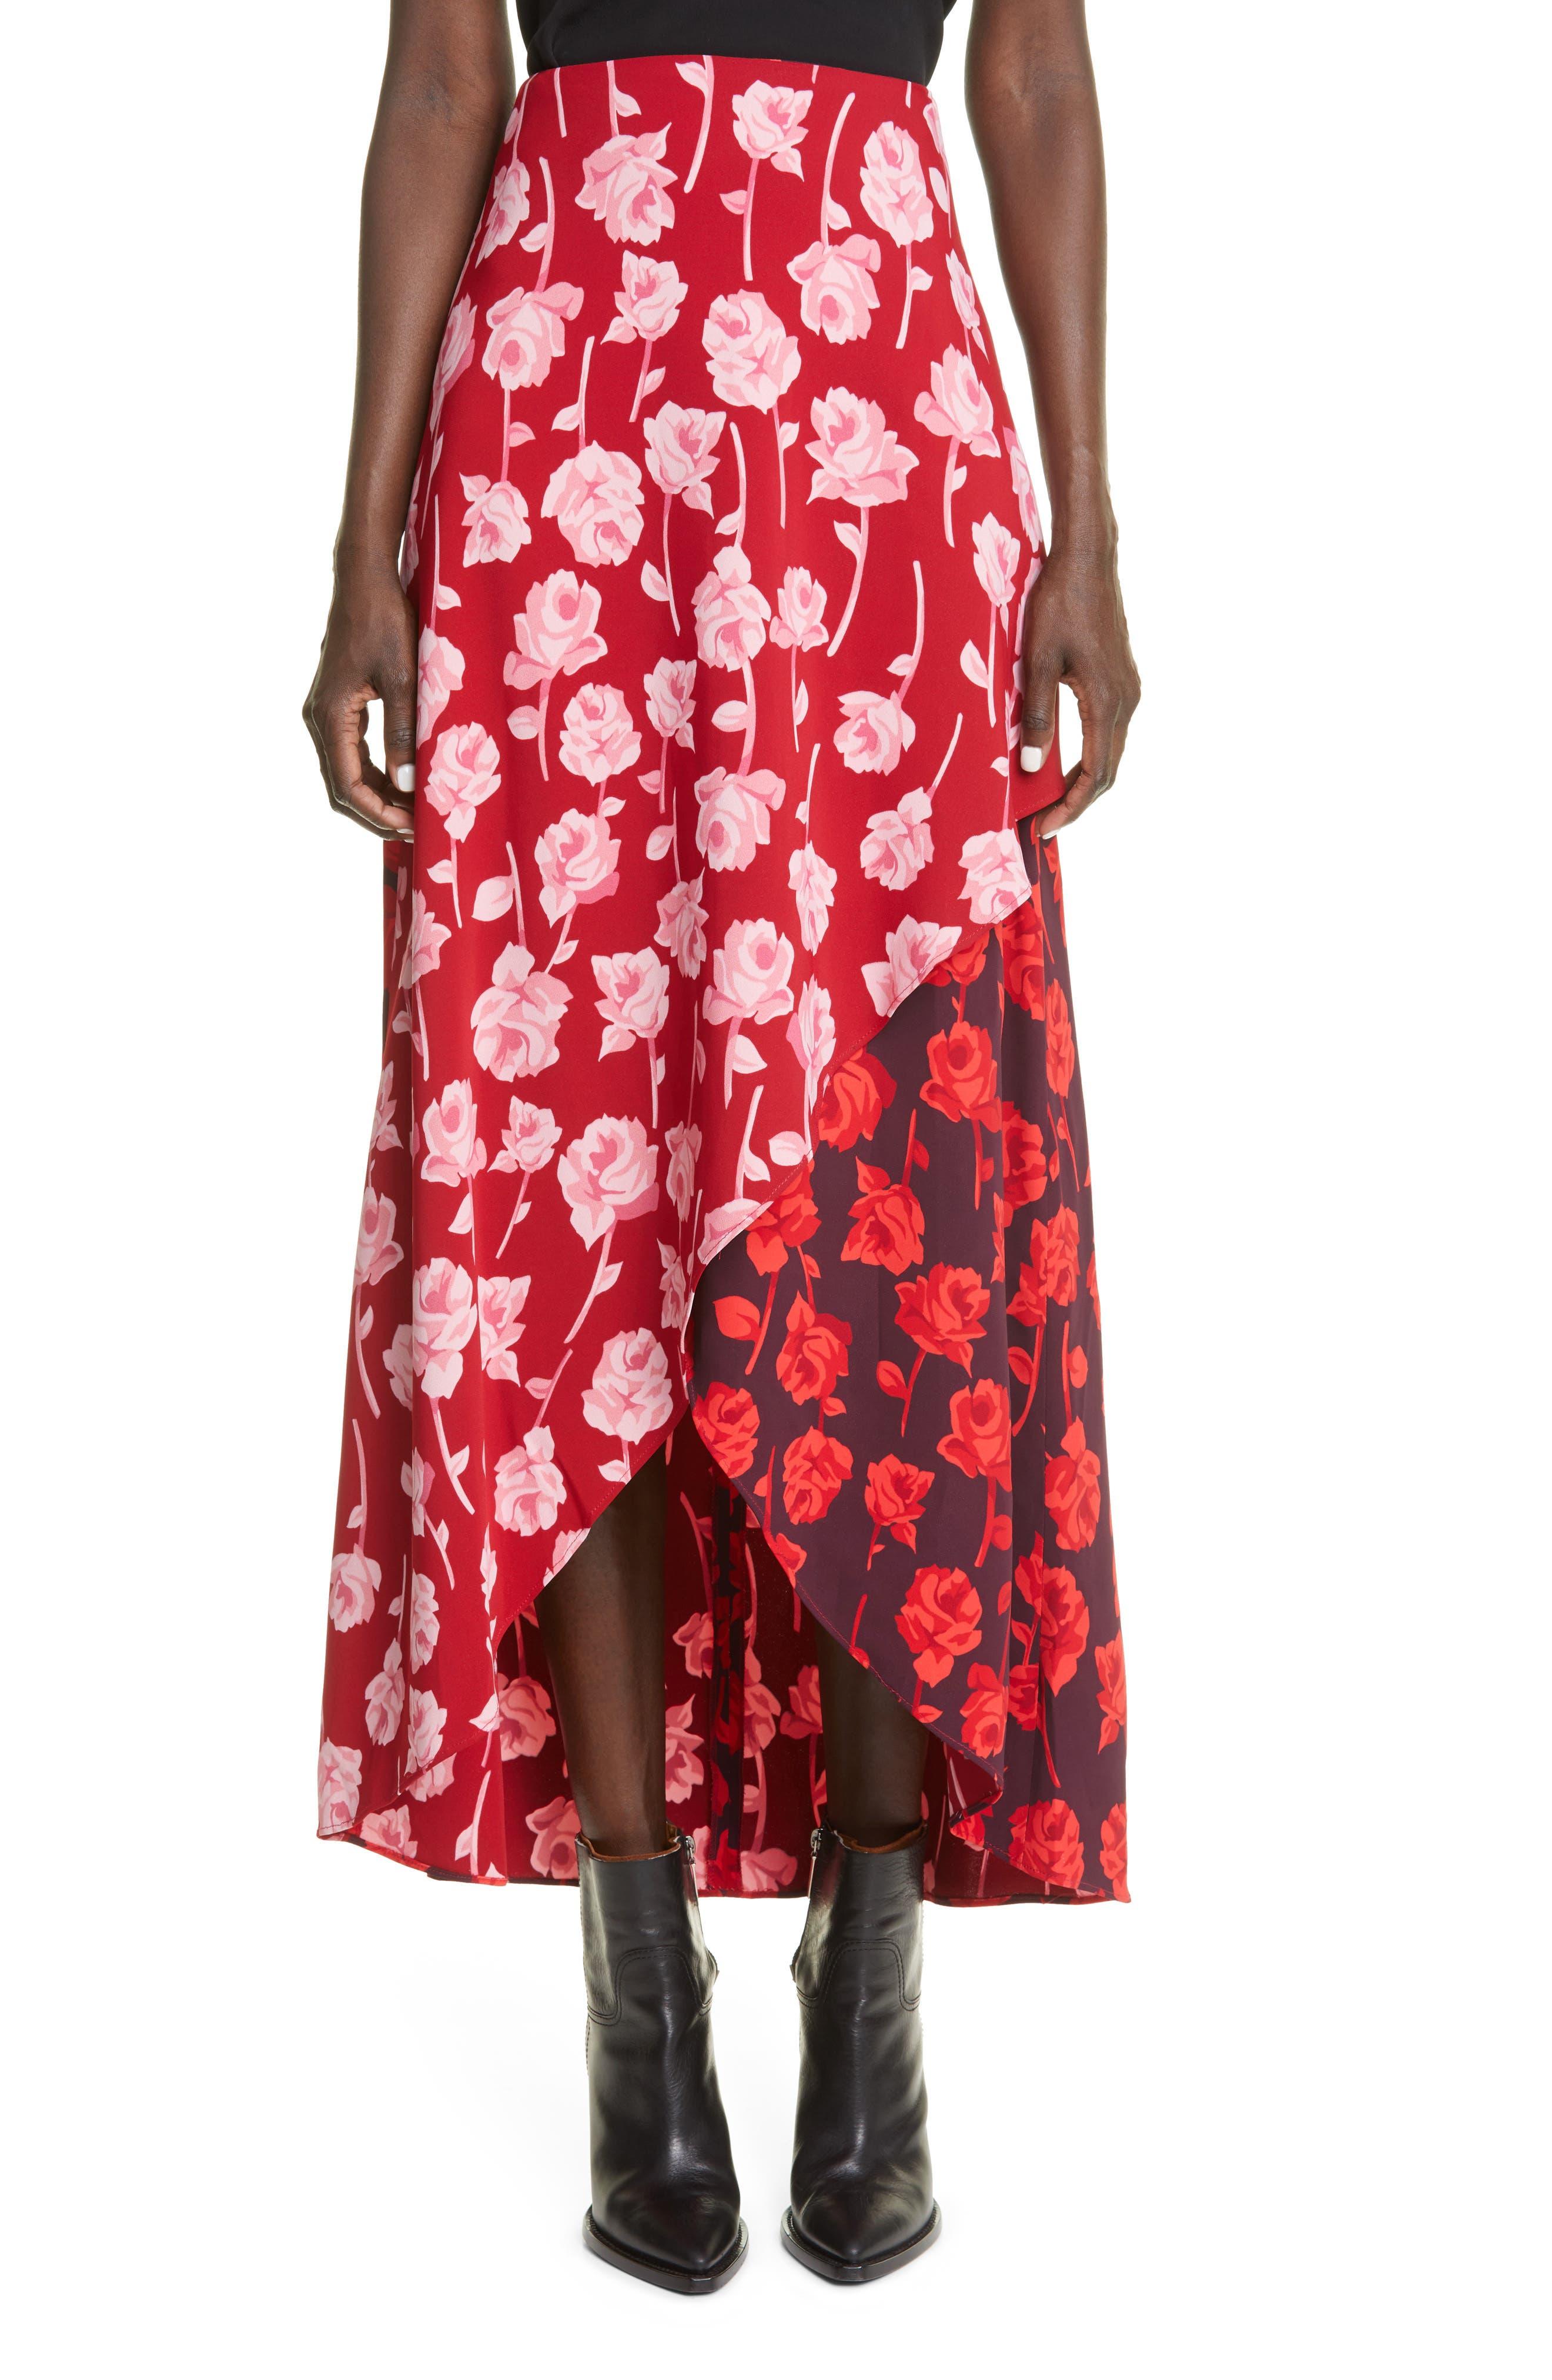 Floral Print High Low Tulip Skirt